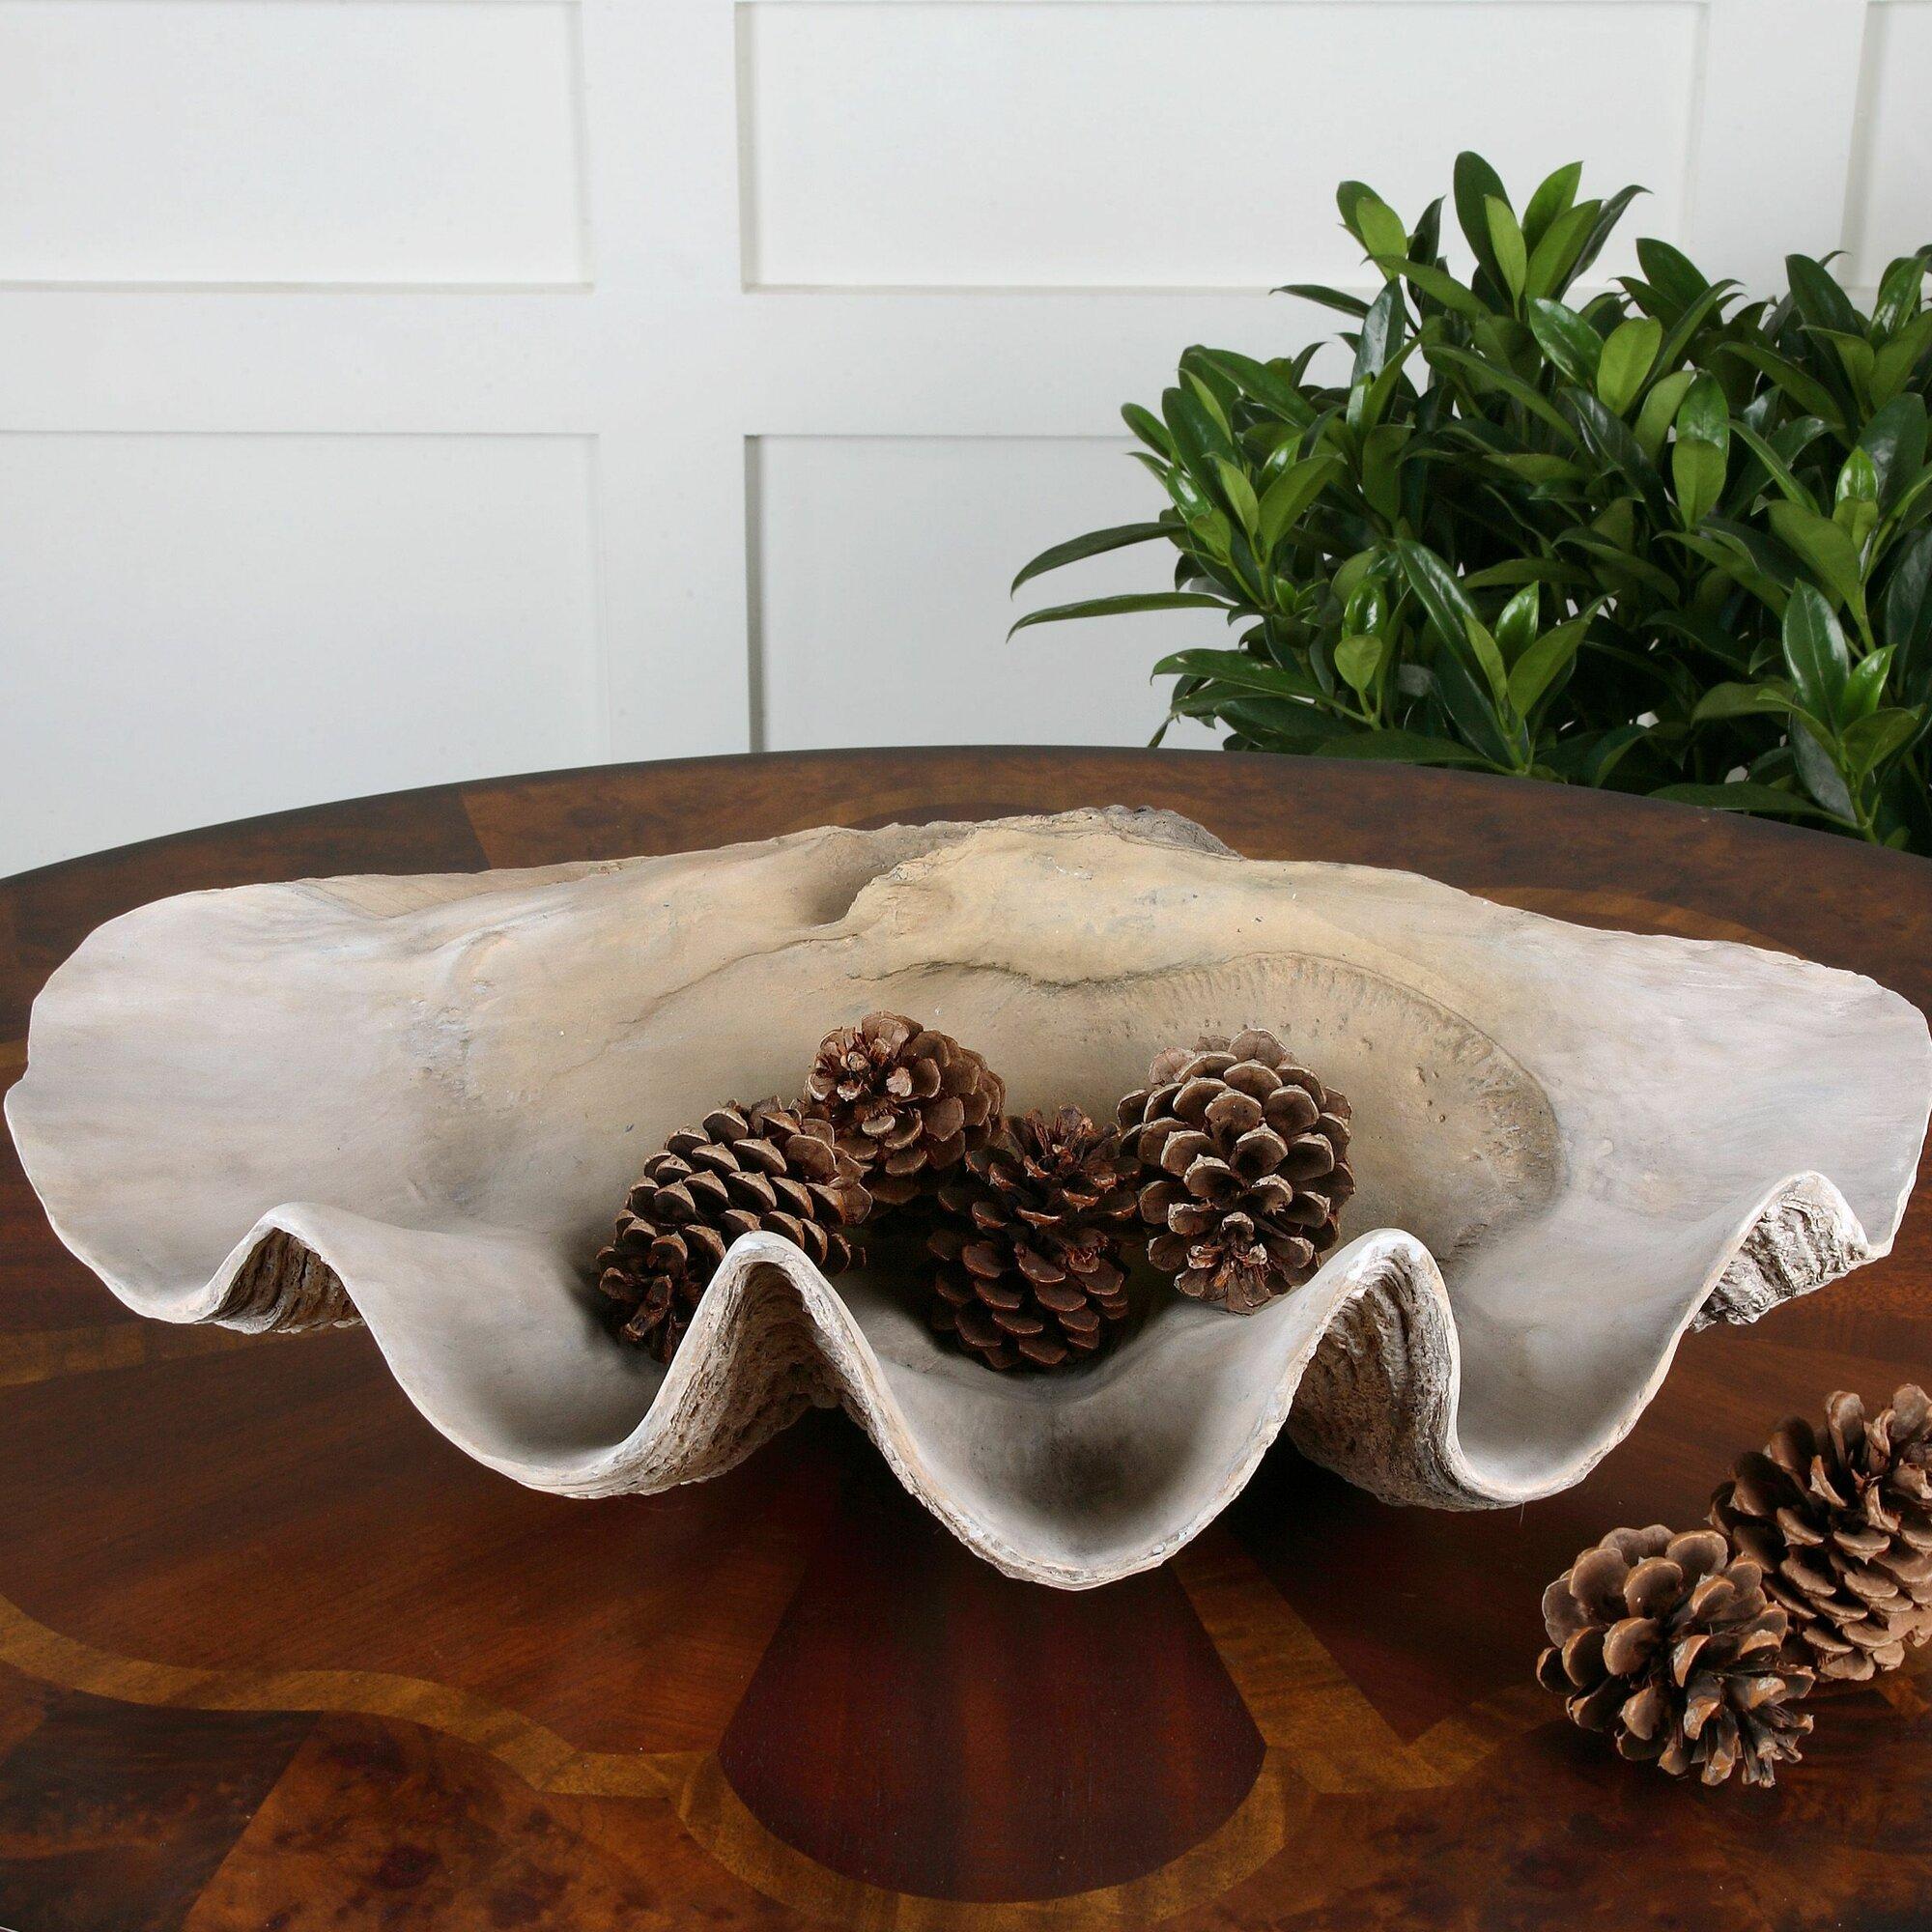 clam shell decorative bowl - Decorative Bowl